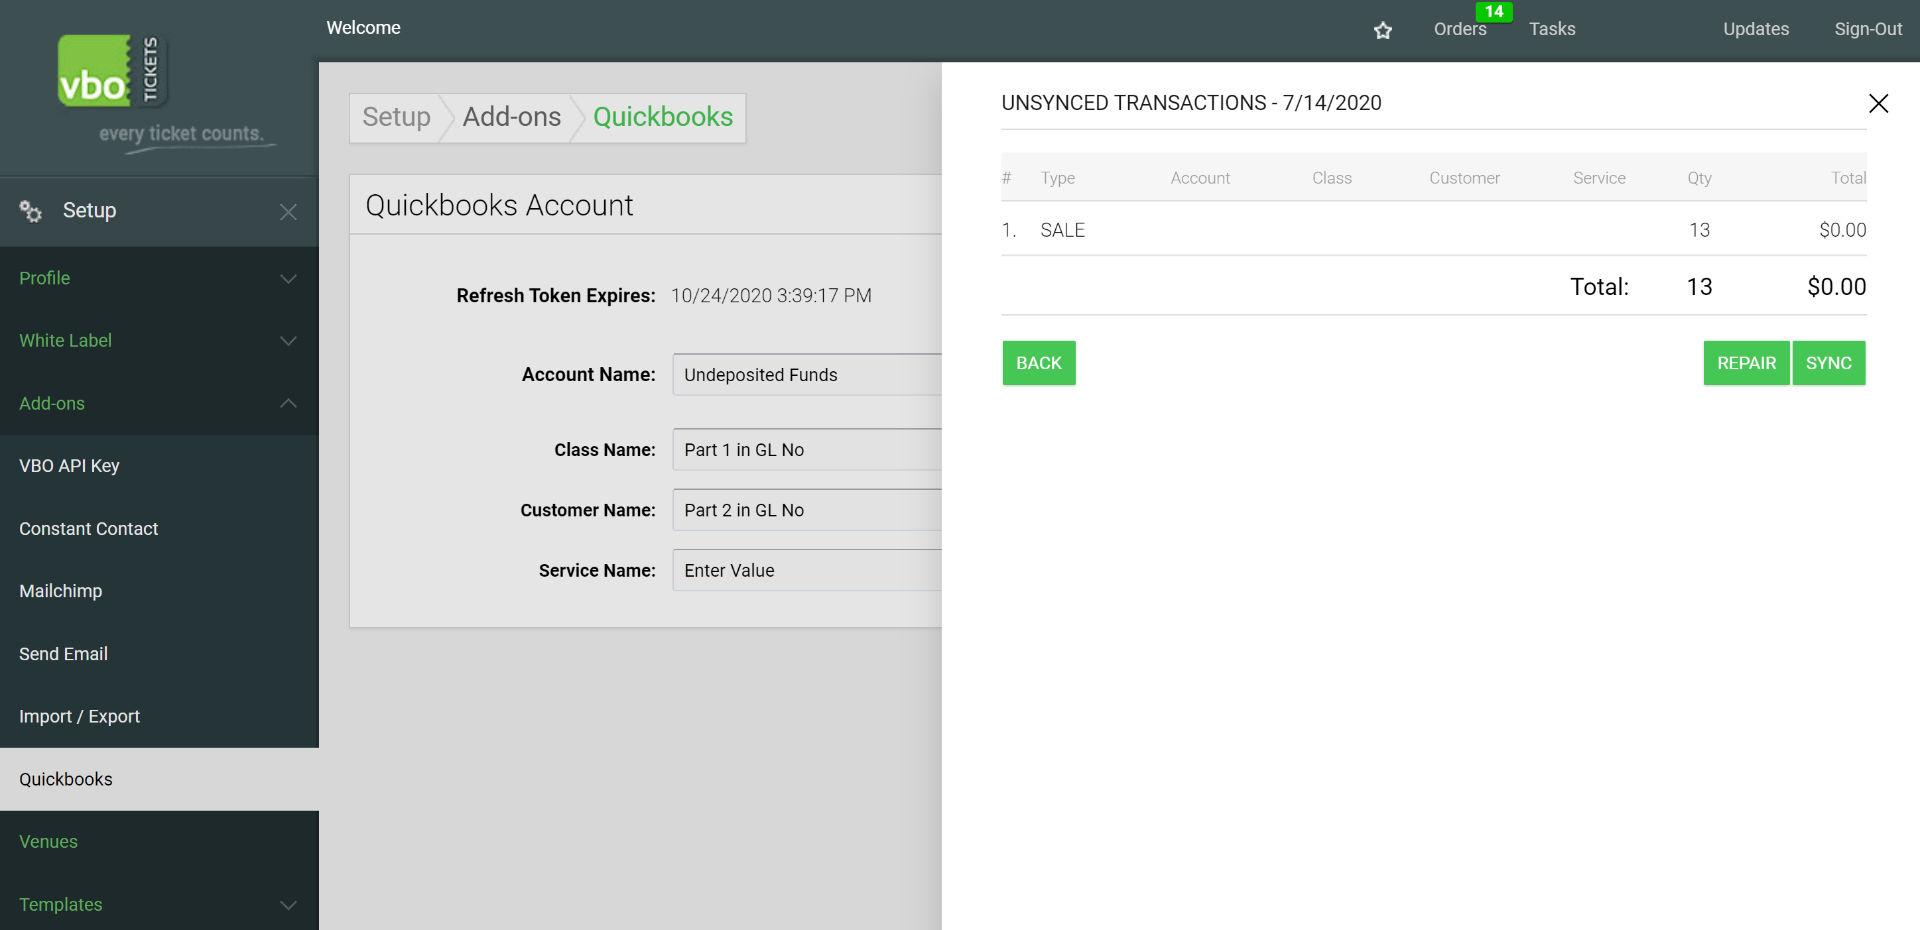 Quickbooks VBO transactions